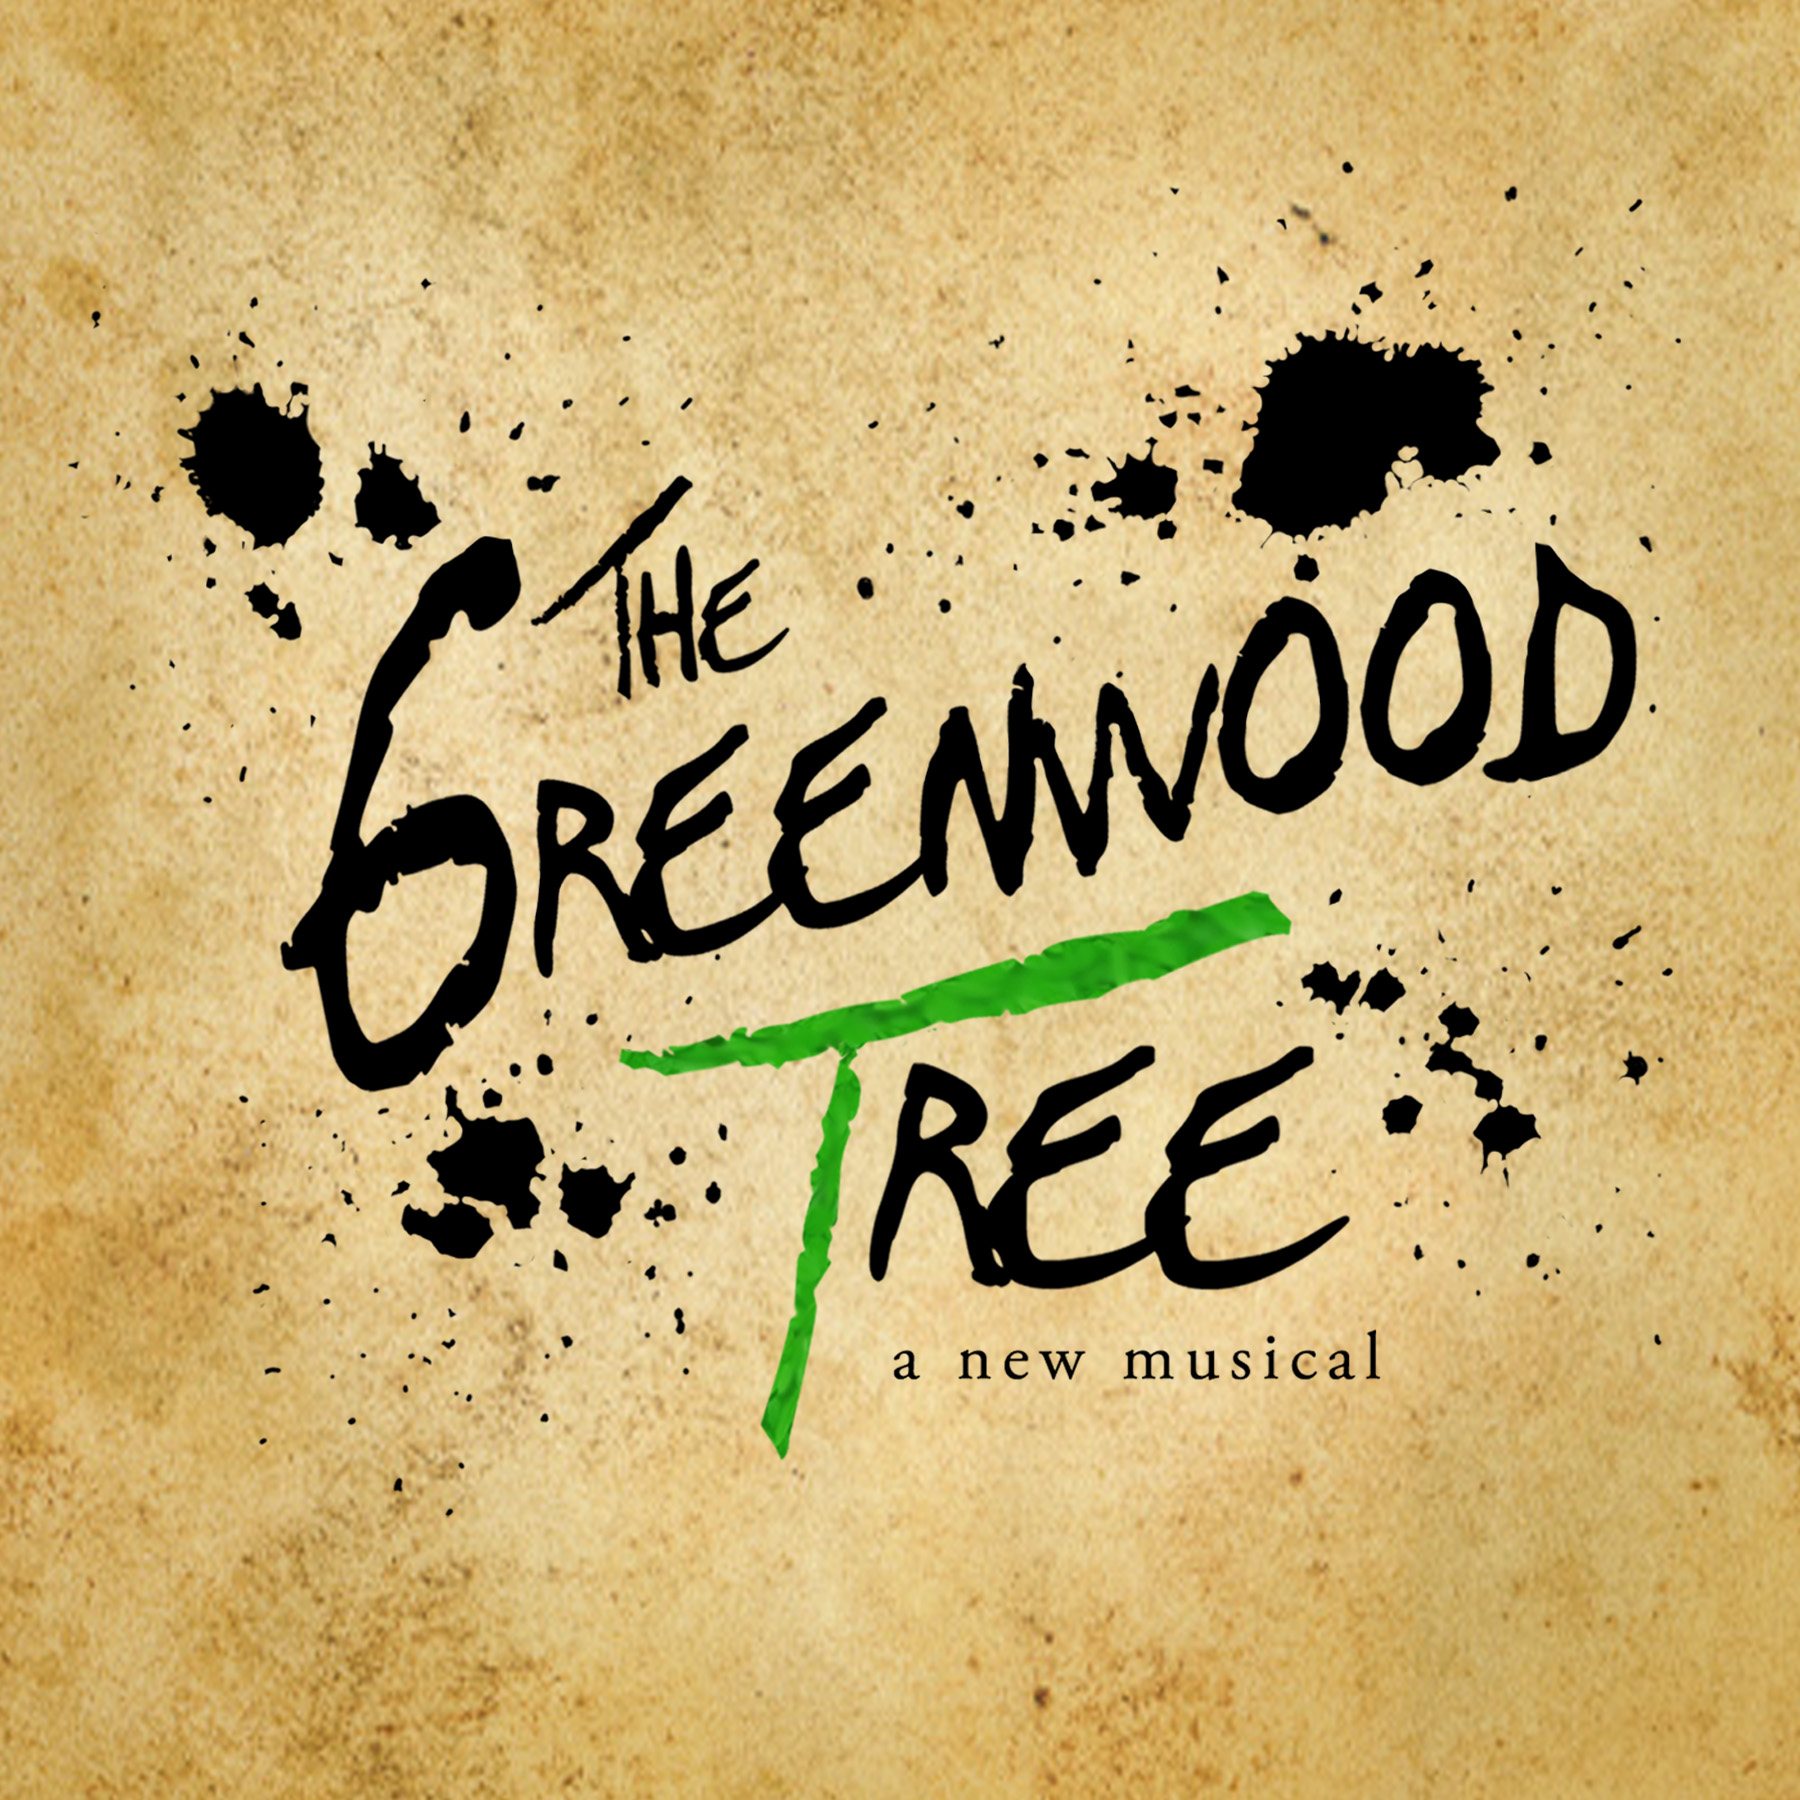 Greenwood Logo.jpg